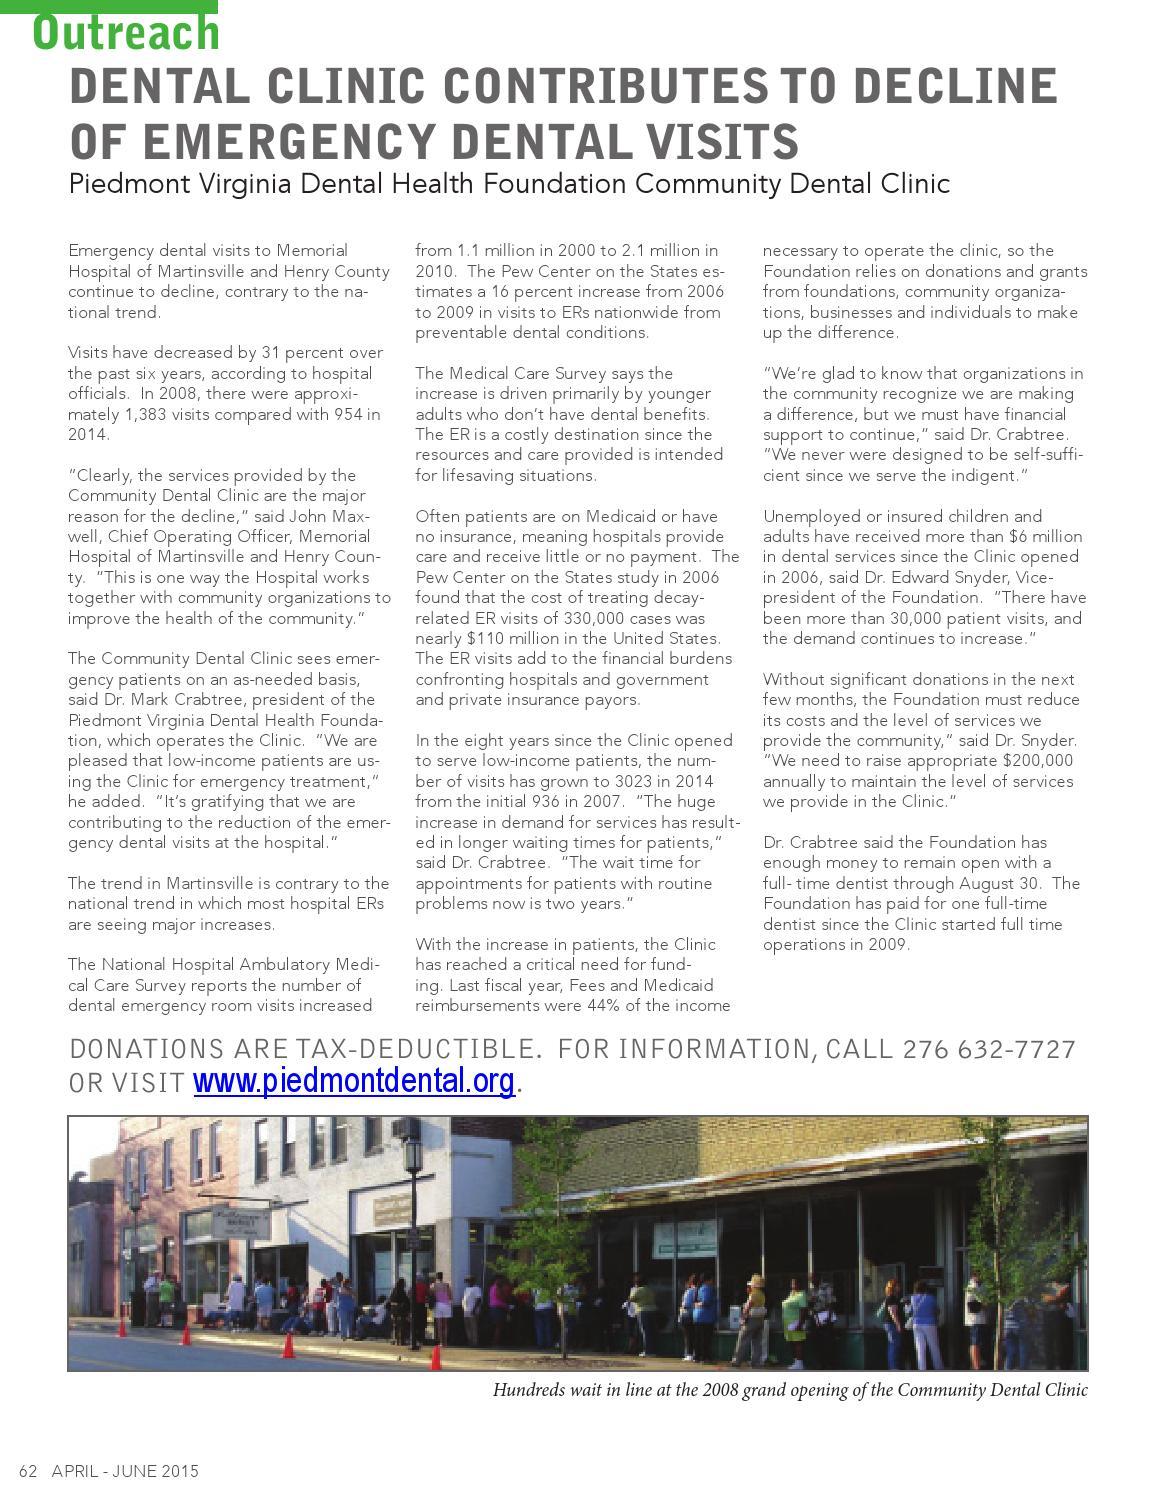 Virginia Dental Journal Vol 92 #2 April-June 2015 by